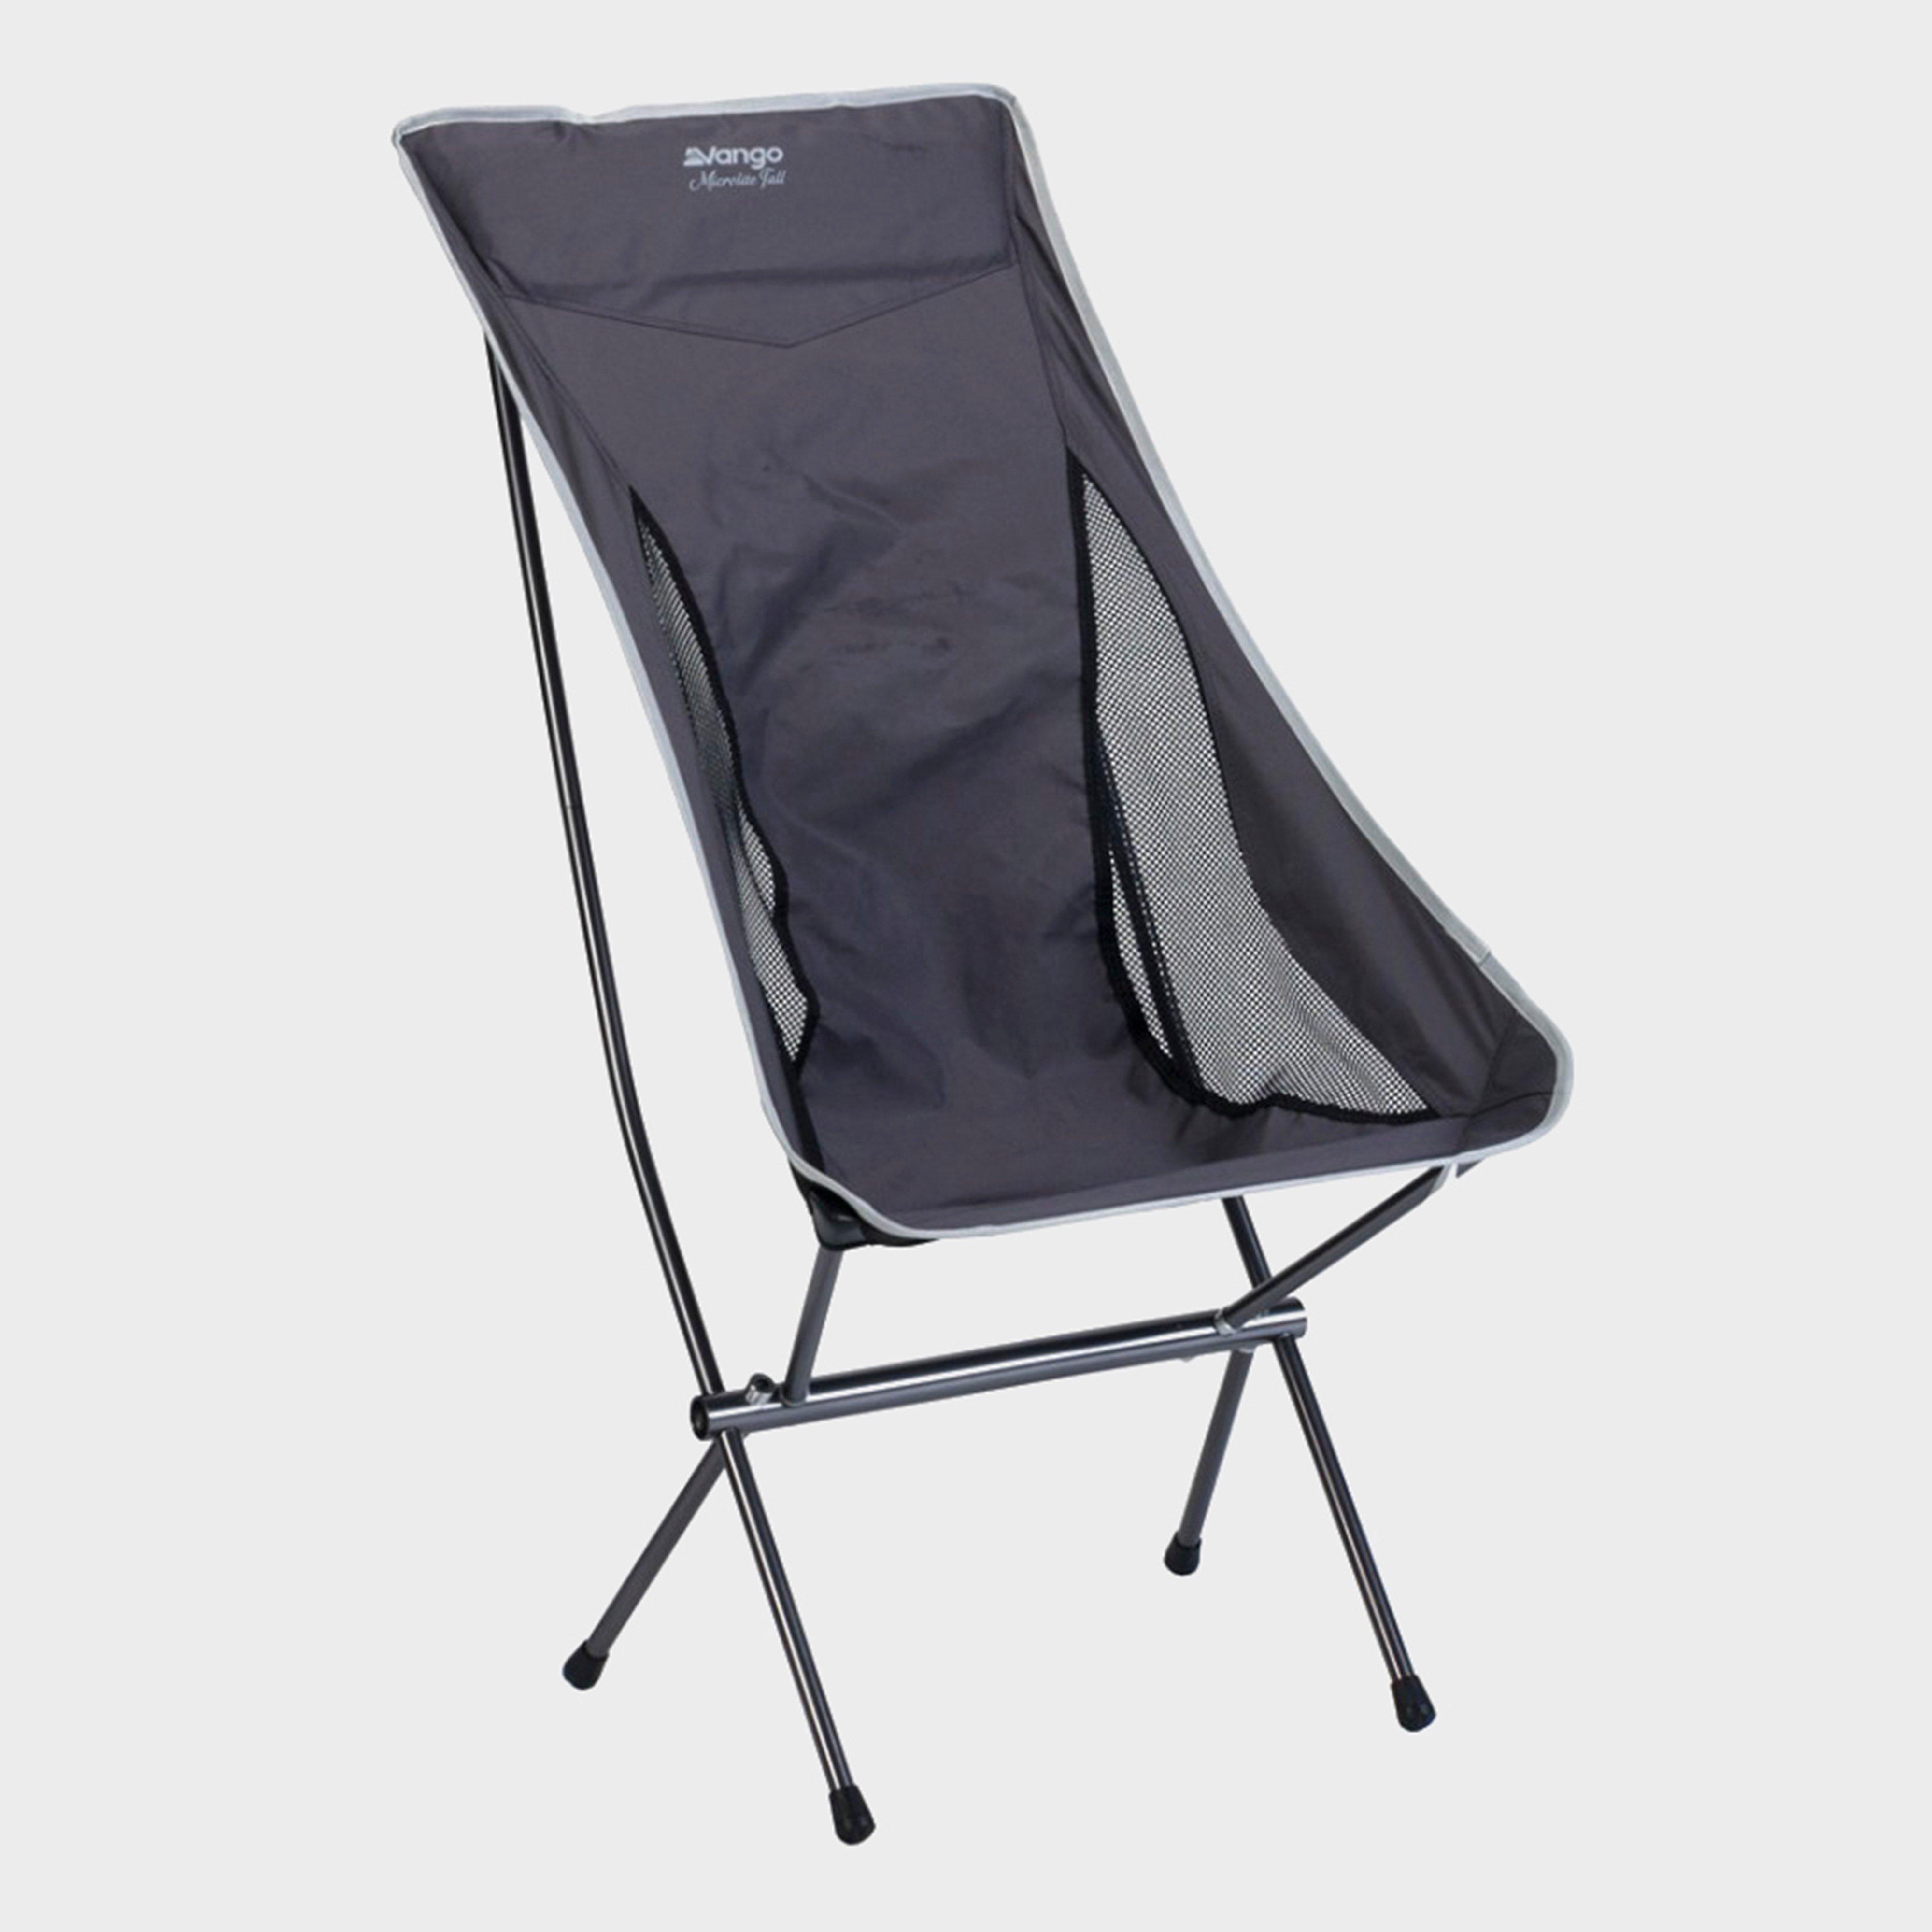 Vango Microlite Tall Chair - Black/Grey, Black/Grey